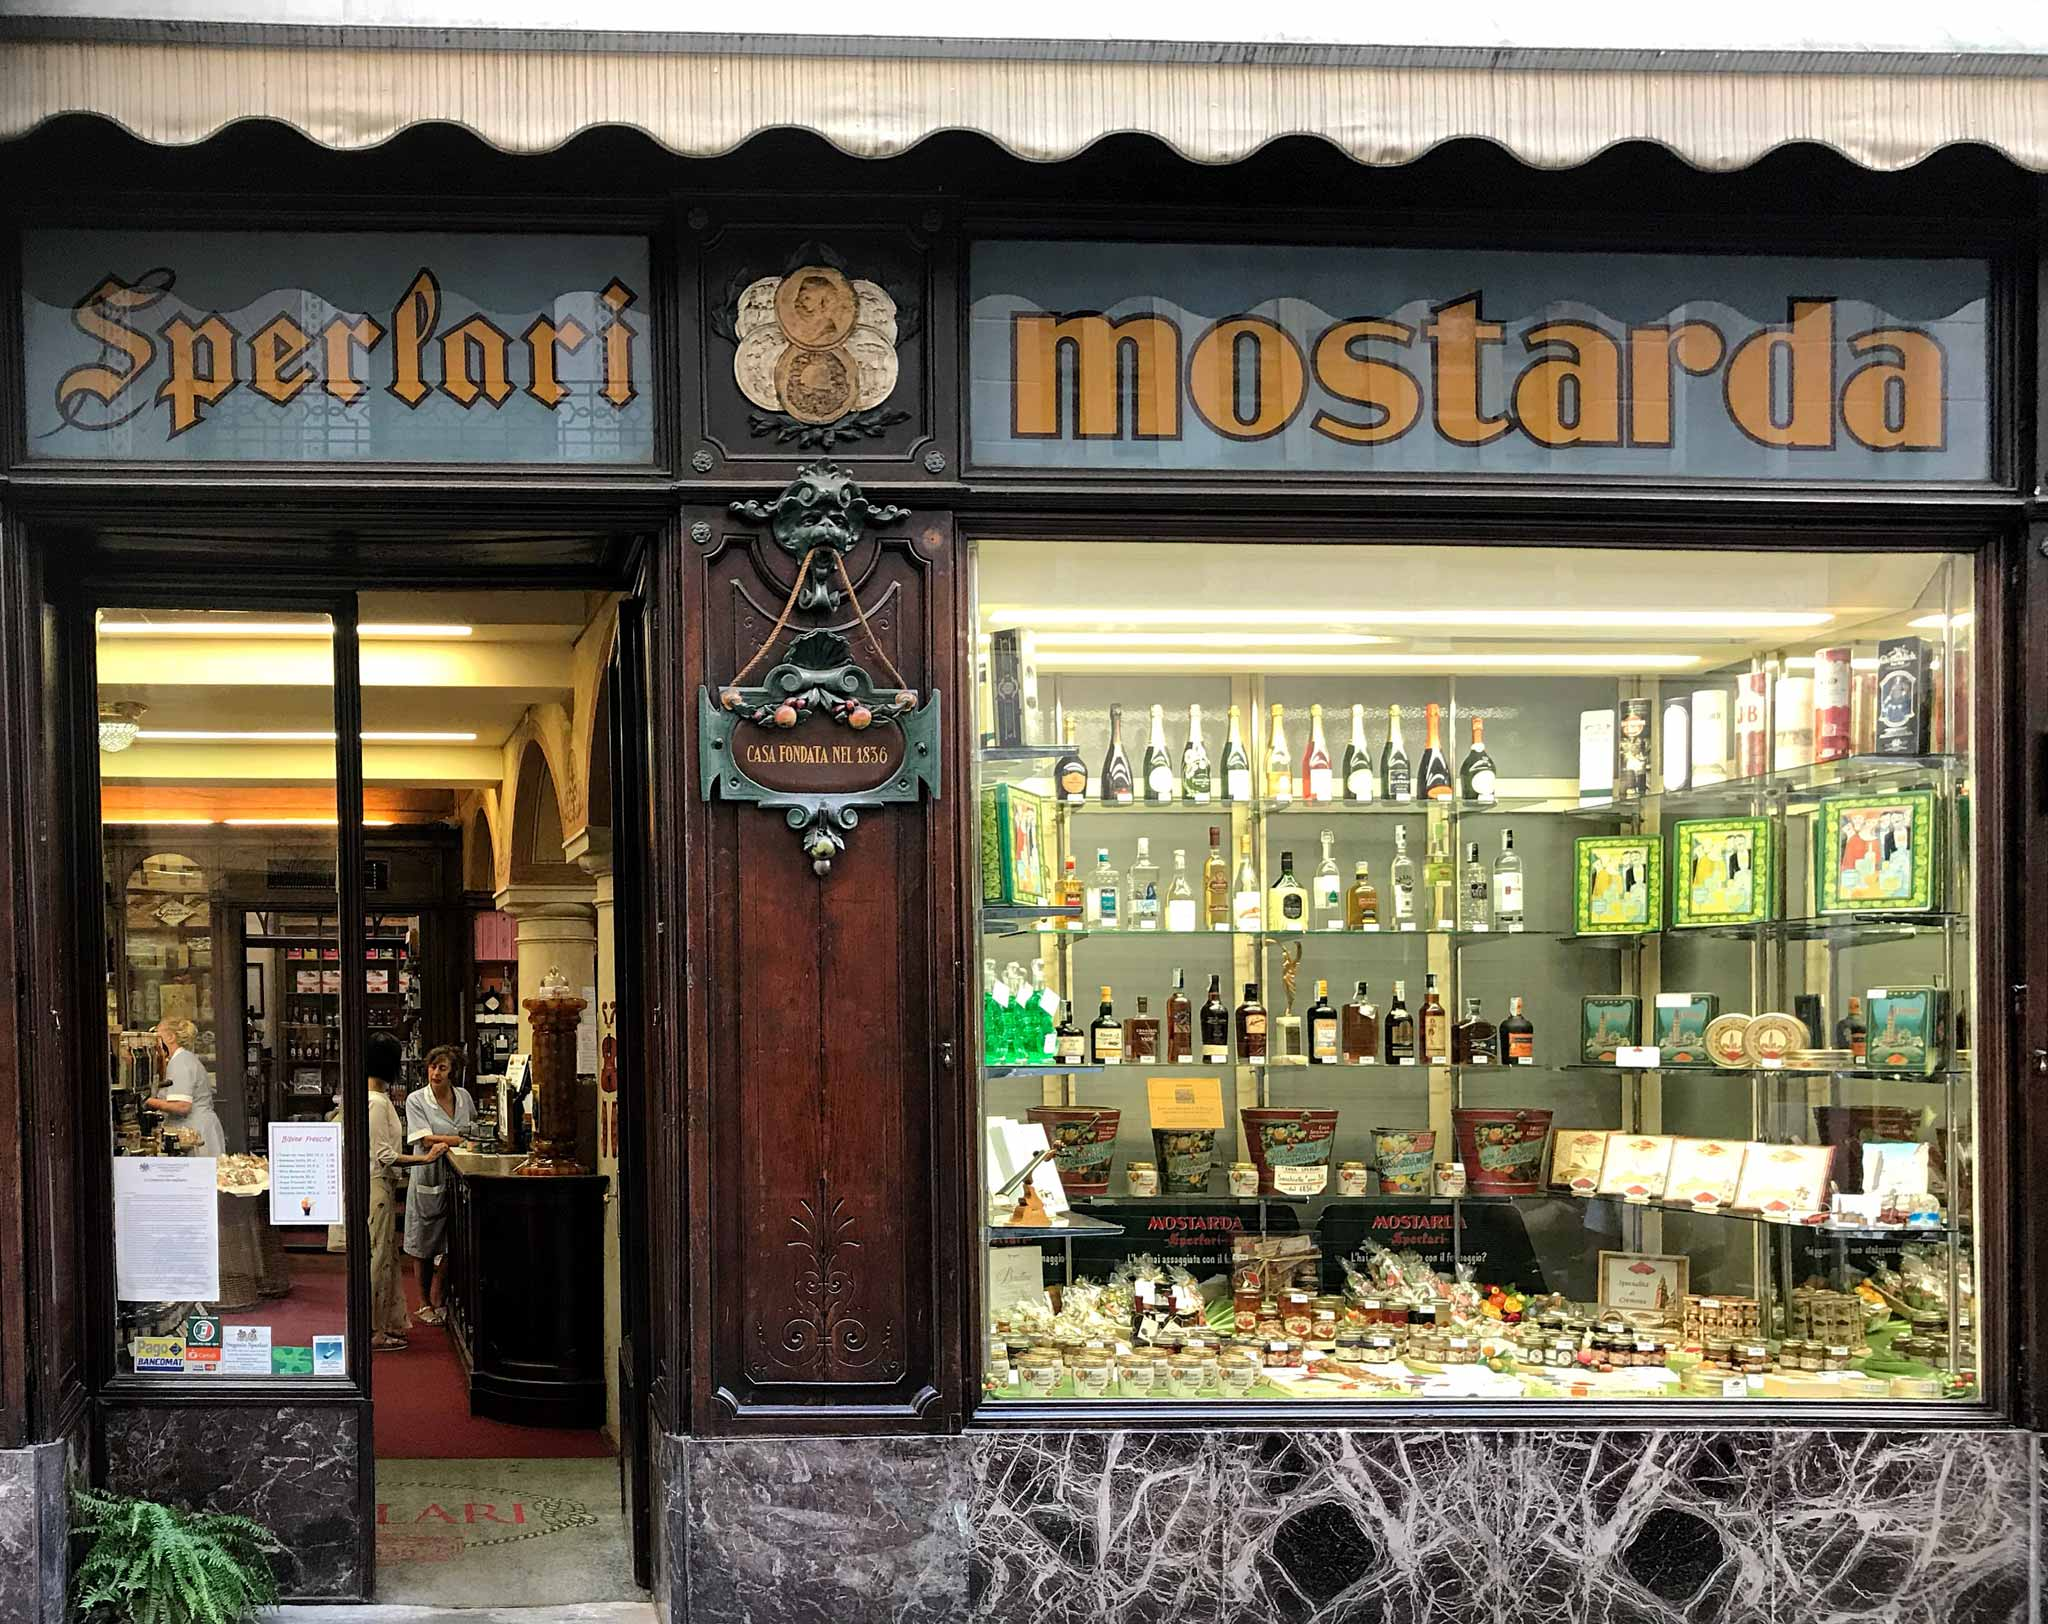 Cremona-negozio-sperlari-via-solferino-torrone-mostarda